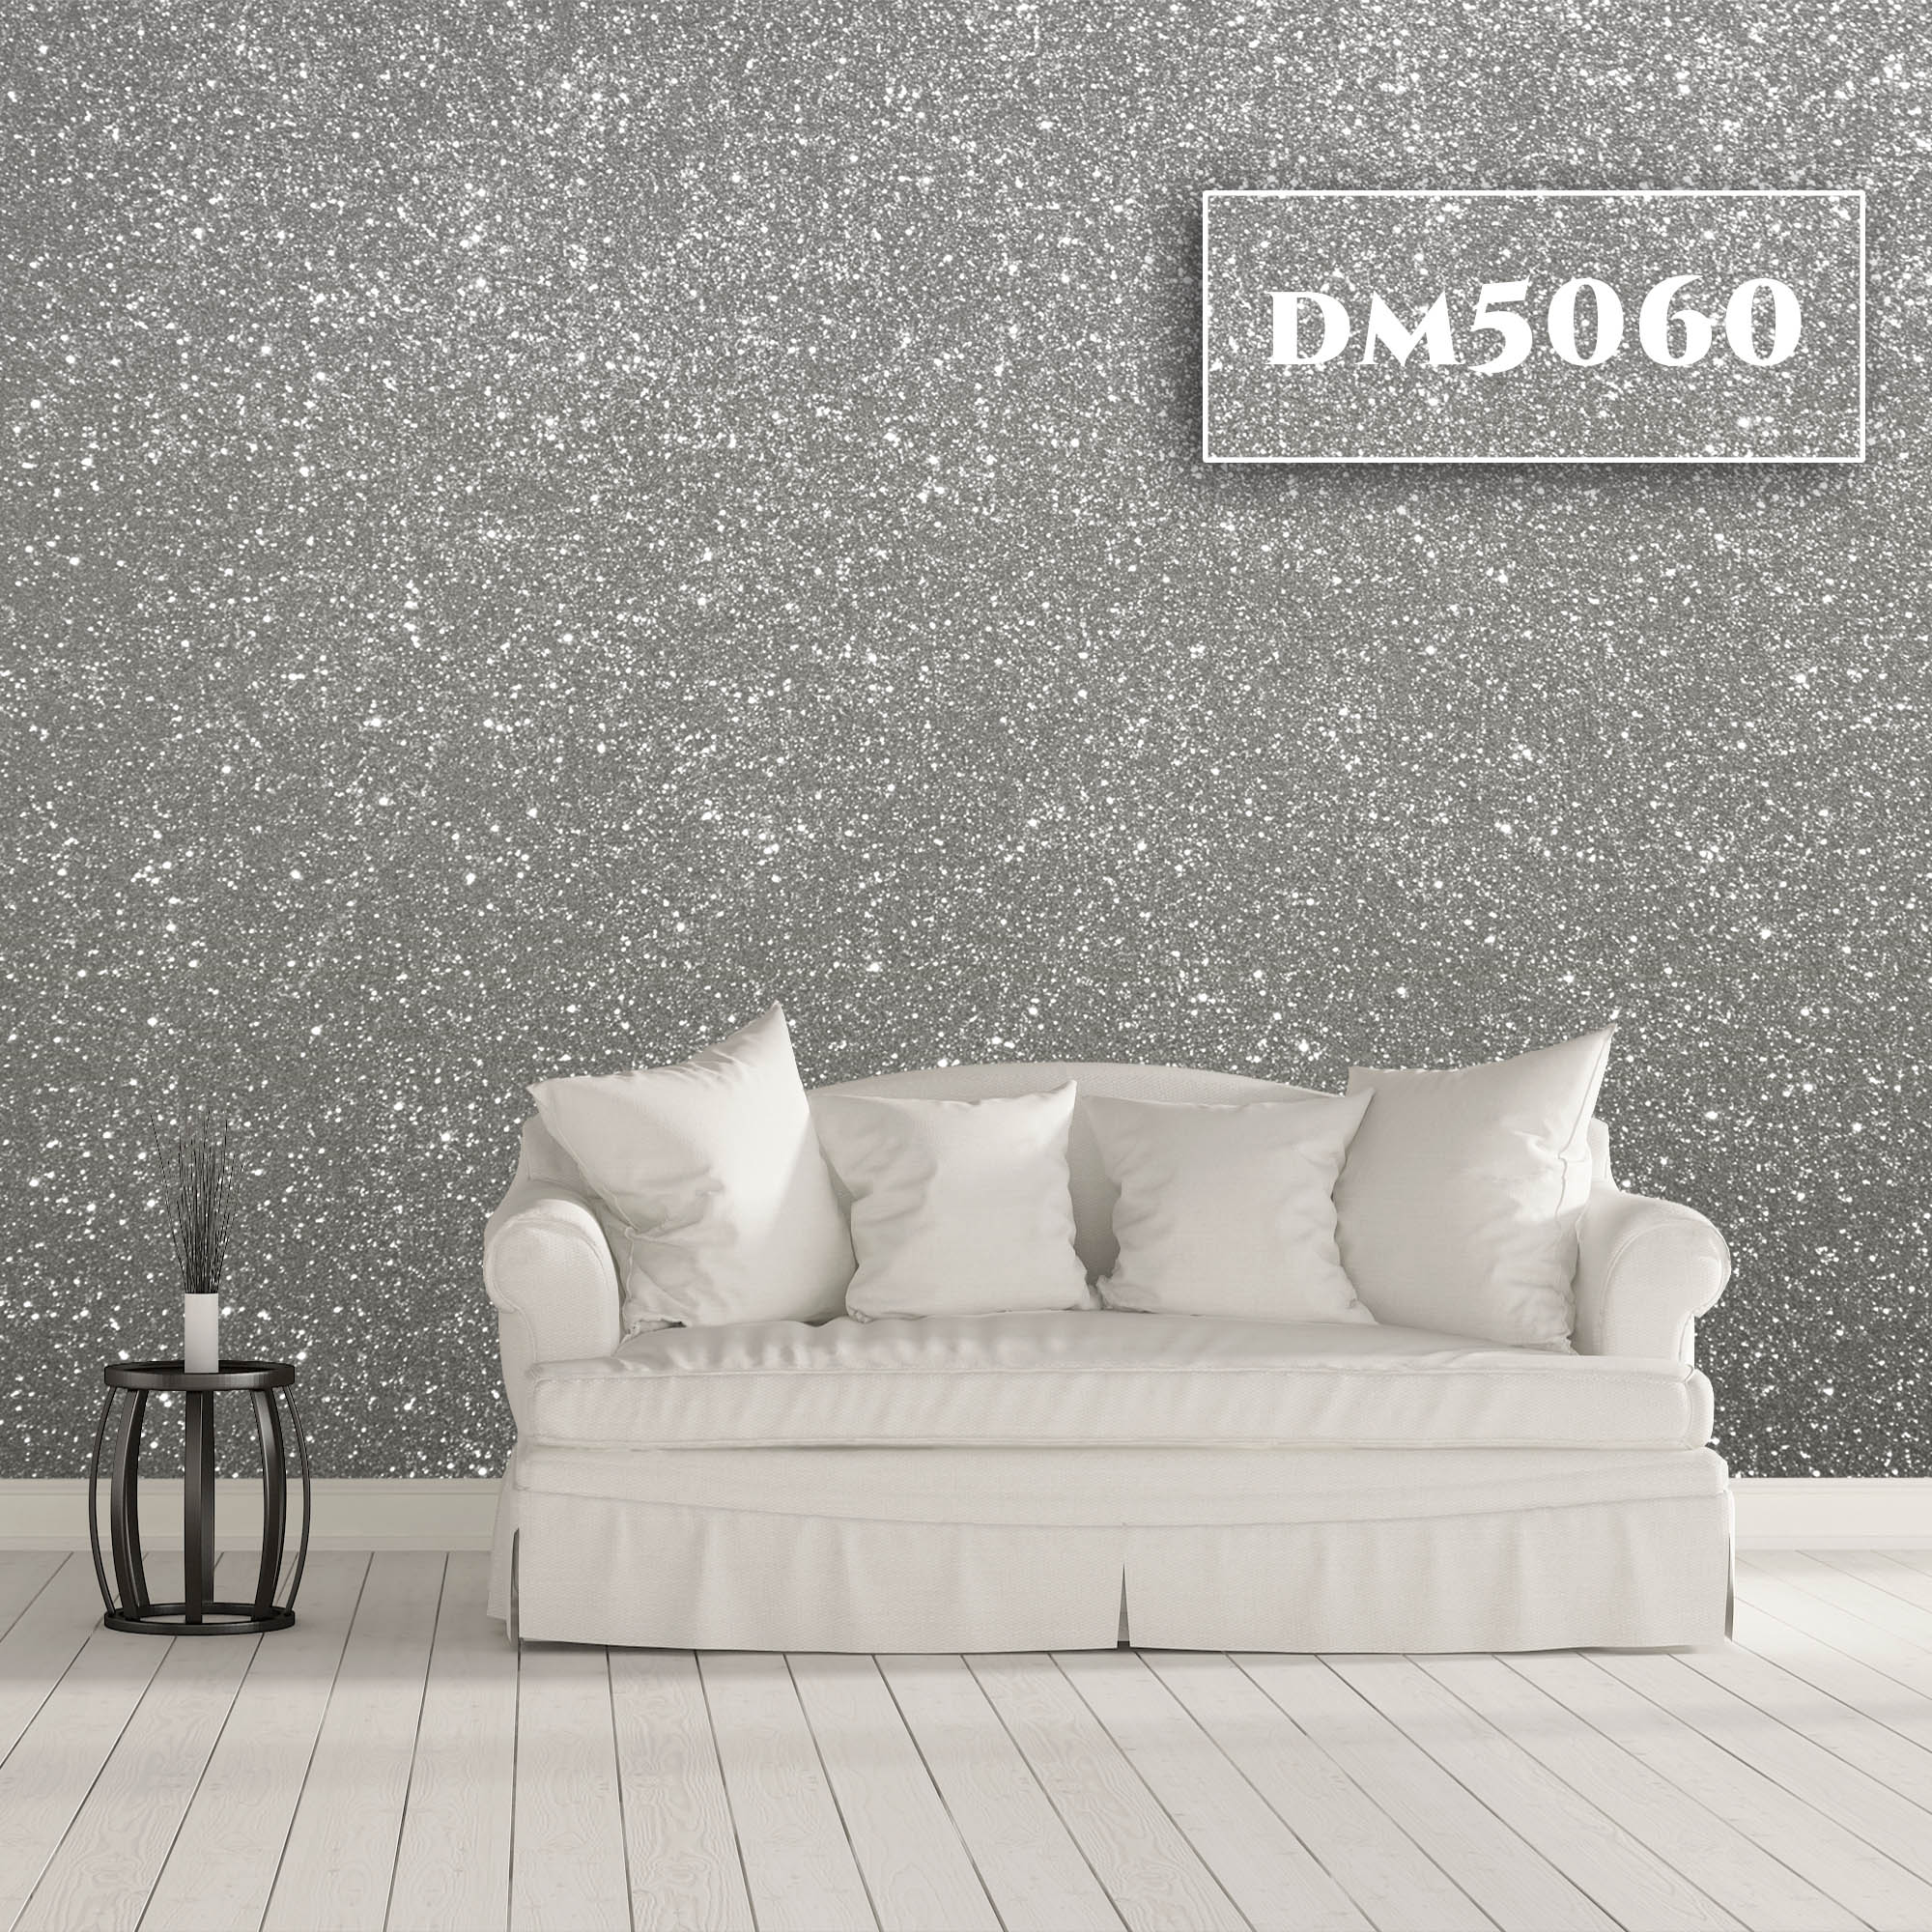 DM5060